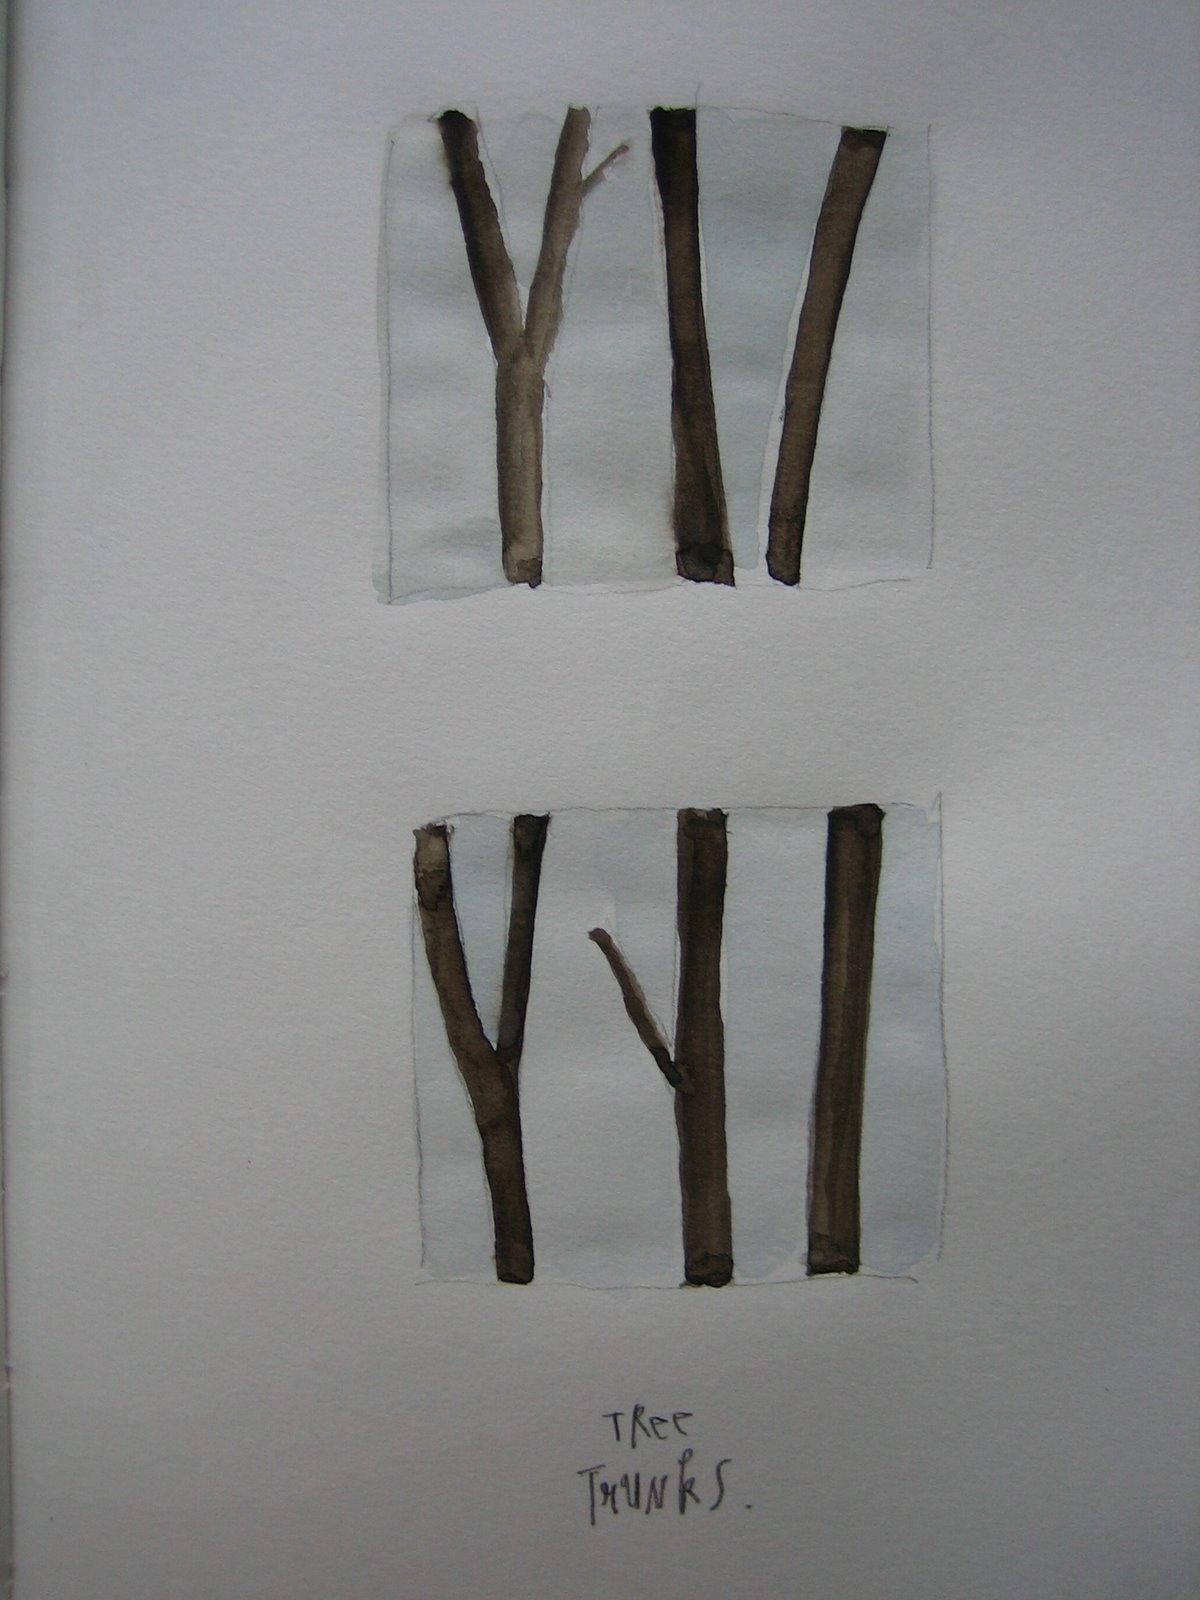 [drawn+tree+trunks.JPG]